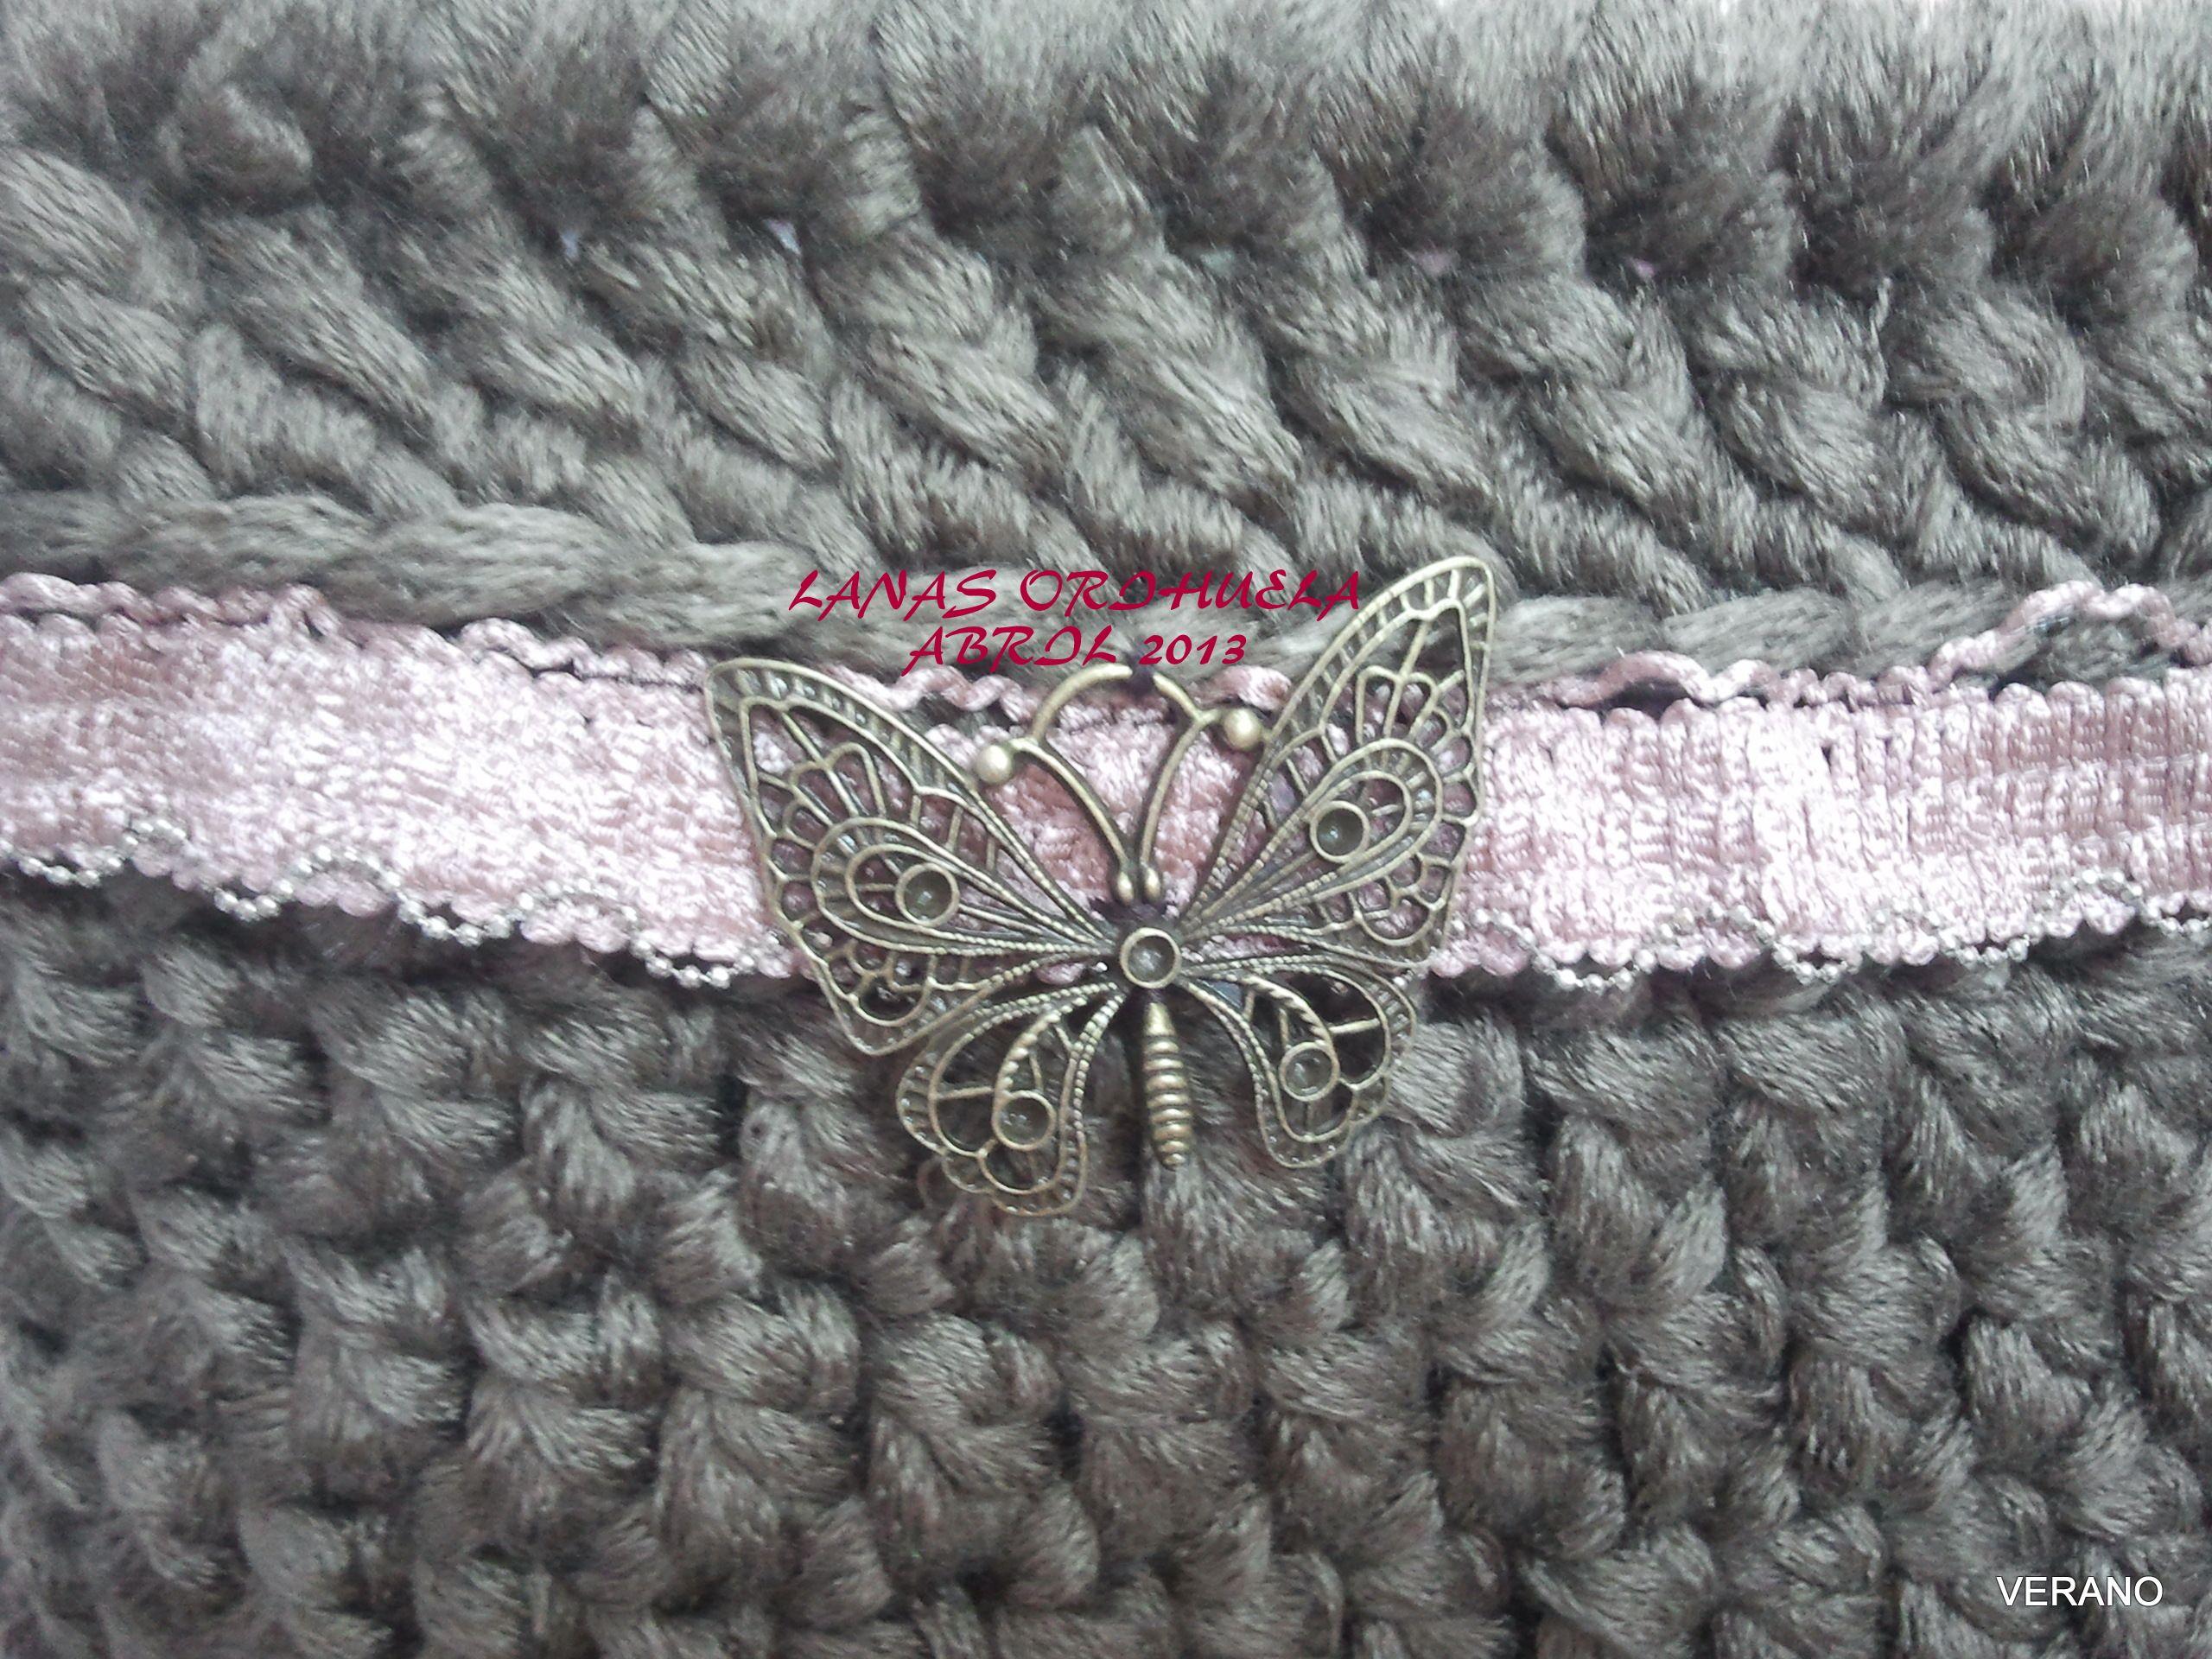 Detalle del bolso de Lana Ondas, de Katia